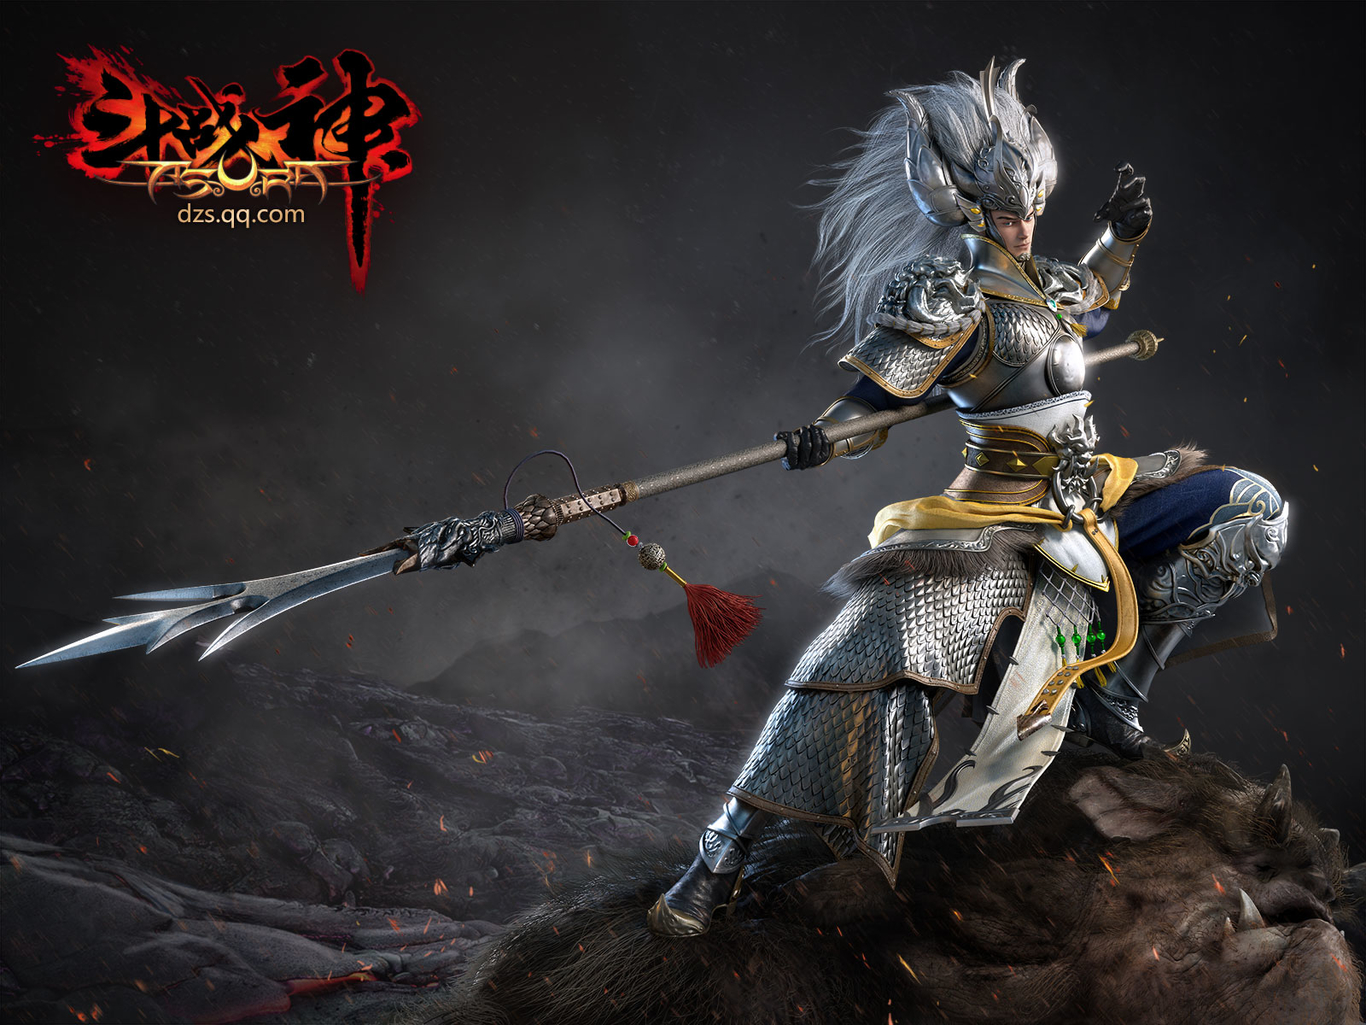 Zhenghu 1278604 1 1da05344 3a6j